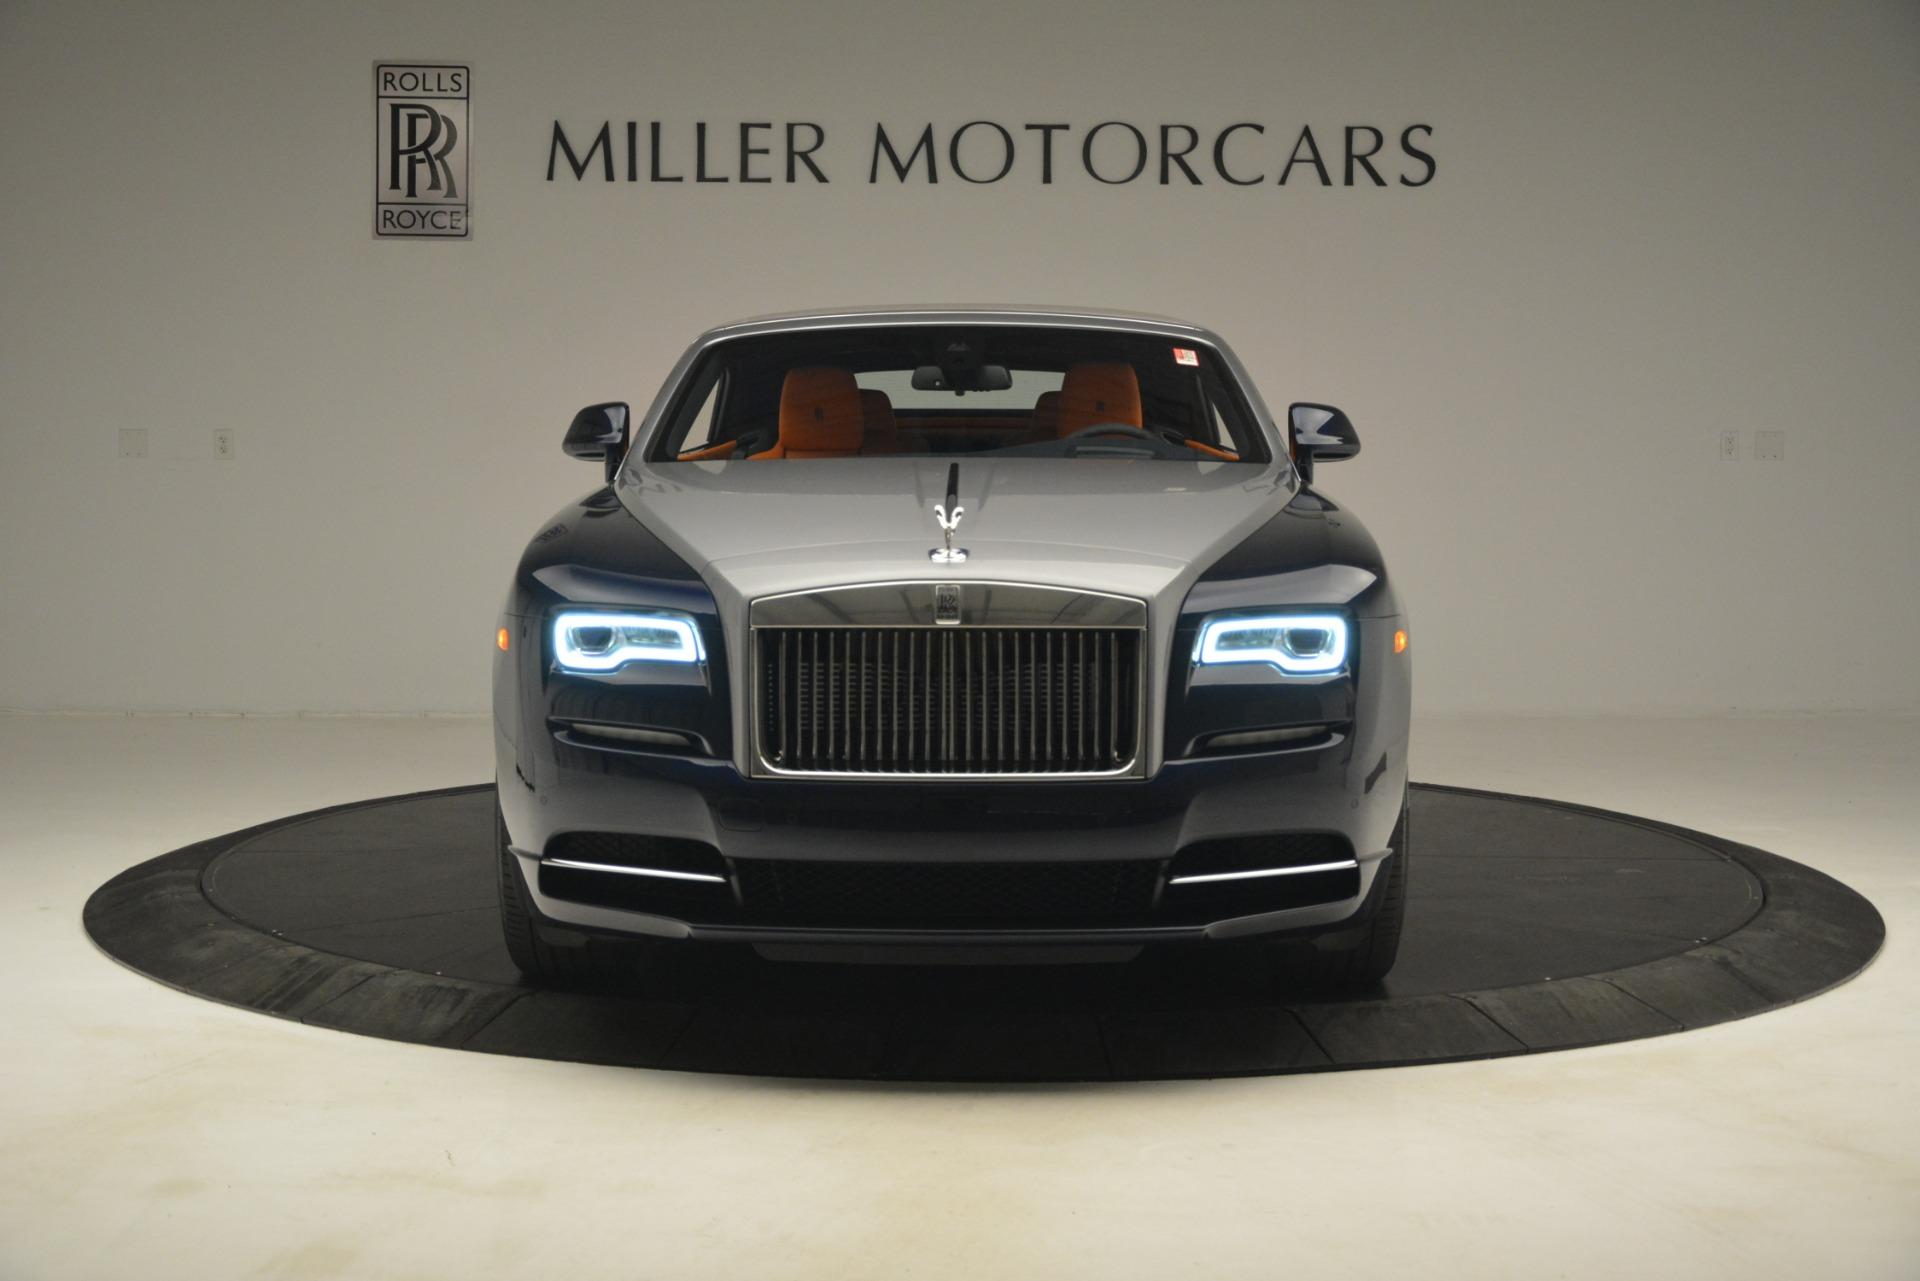 New 2019 Rolls-Royce Dawn  For Sale In Greenwich, CT 2701_p35